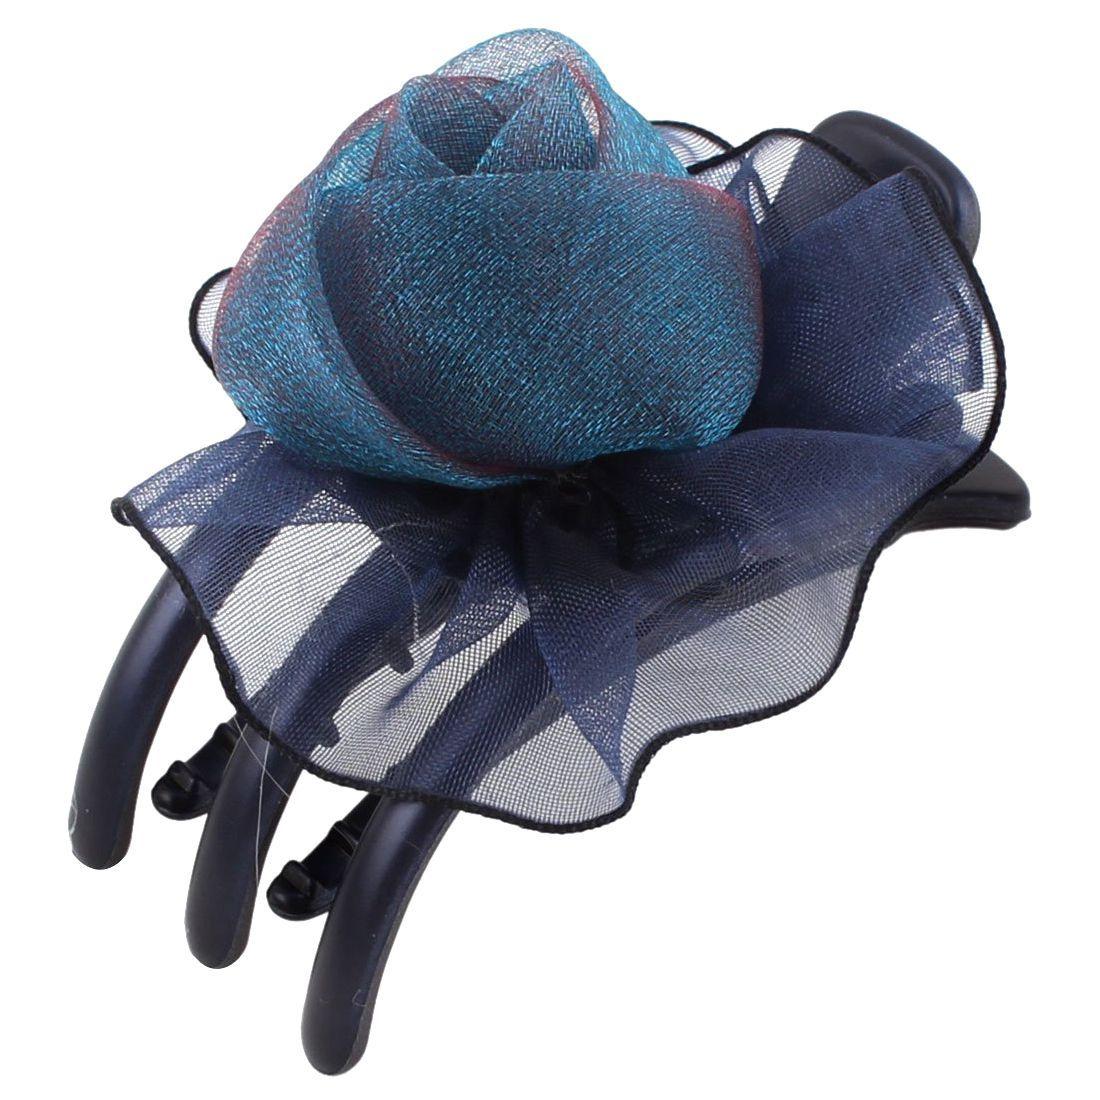 Best sale lady organza rose detail teeth side hair clip clamp